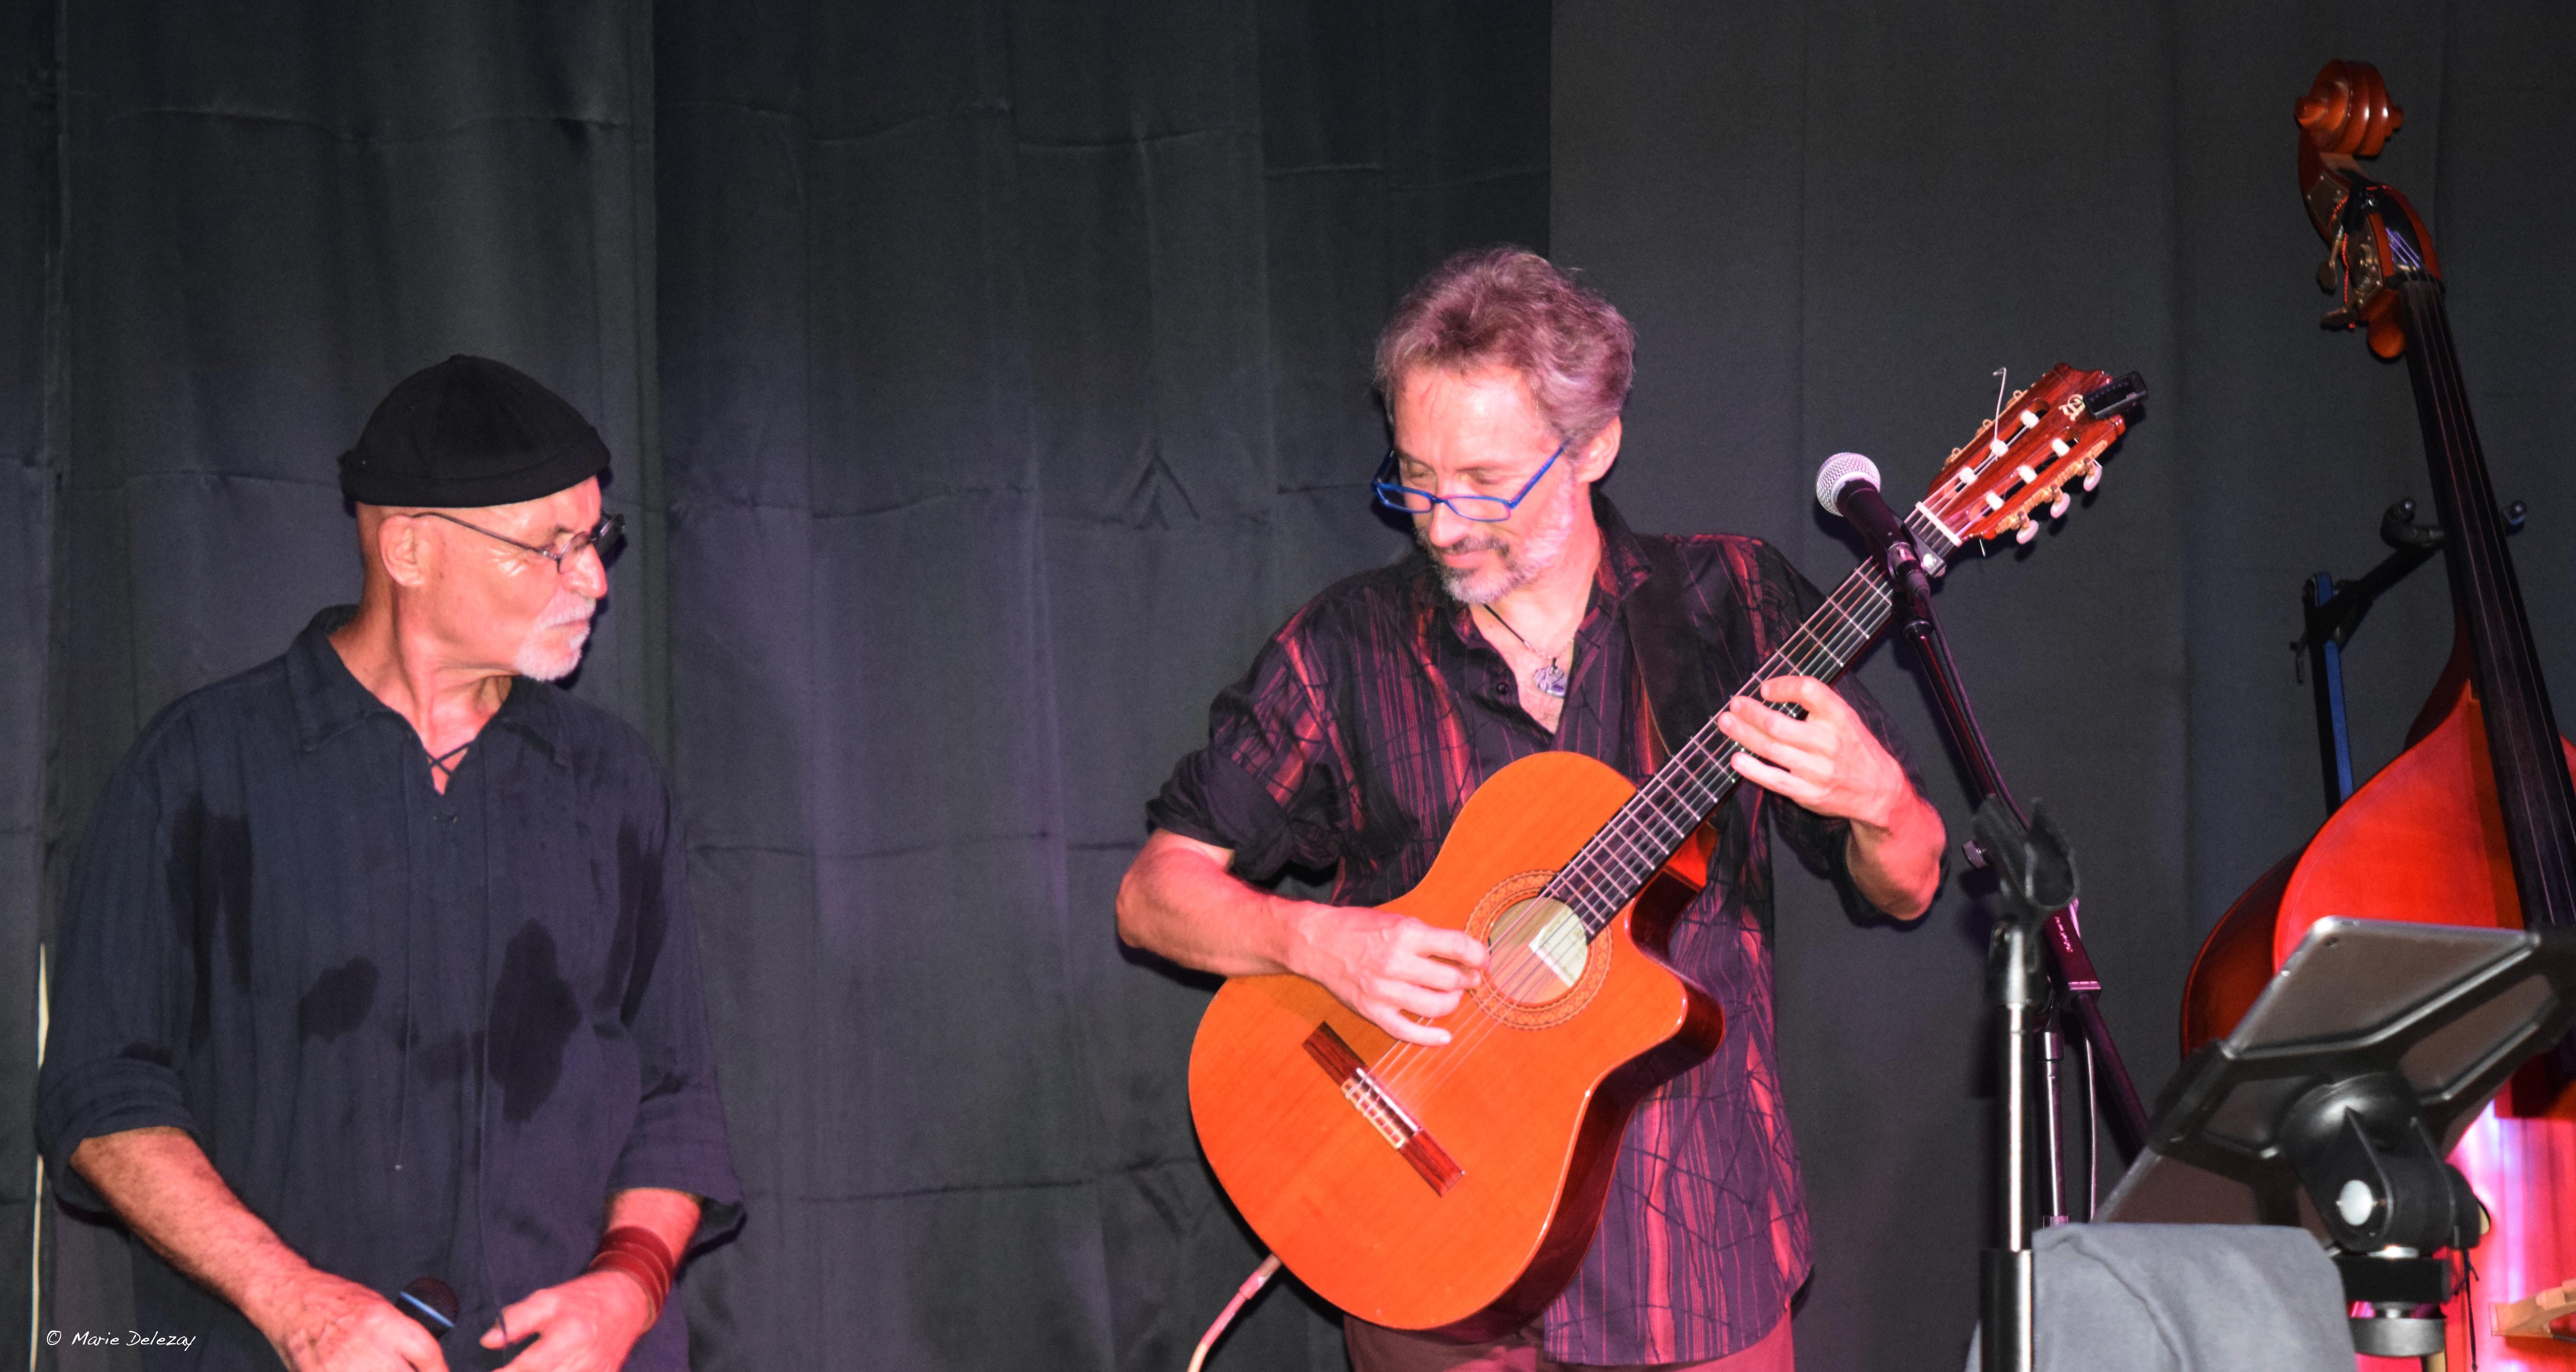 Didier & Stéphane